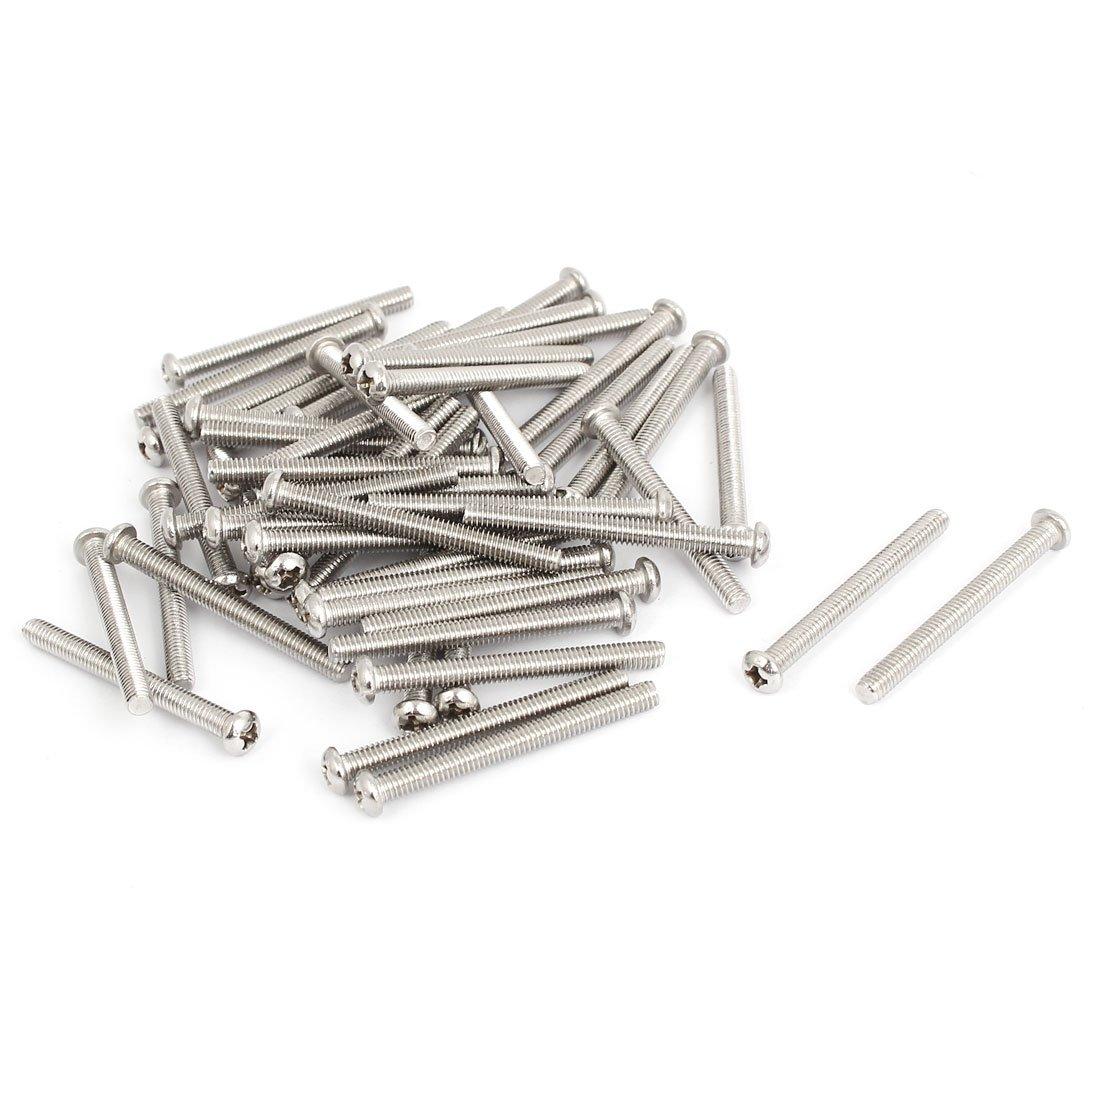 M4 x 35mm M4x35mm Knobs Screws Drawer Pull Handle Screws 304 Stainless Steel Phillips Machine Screws 50pcs